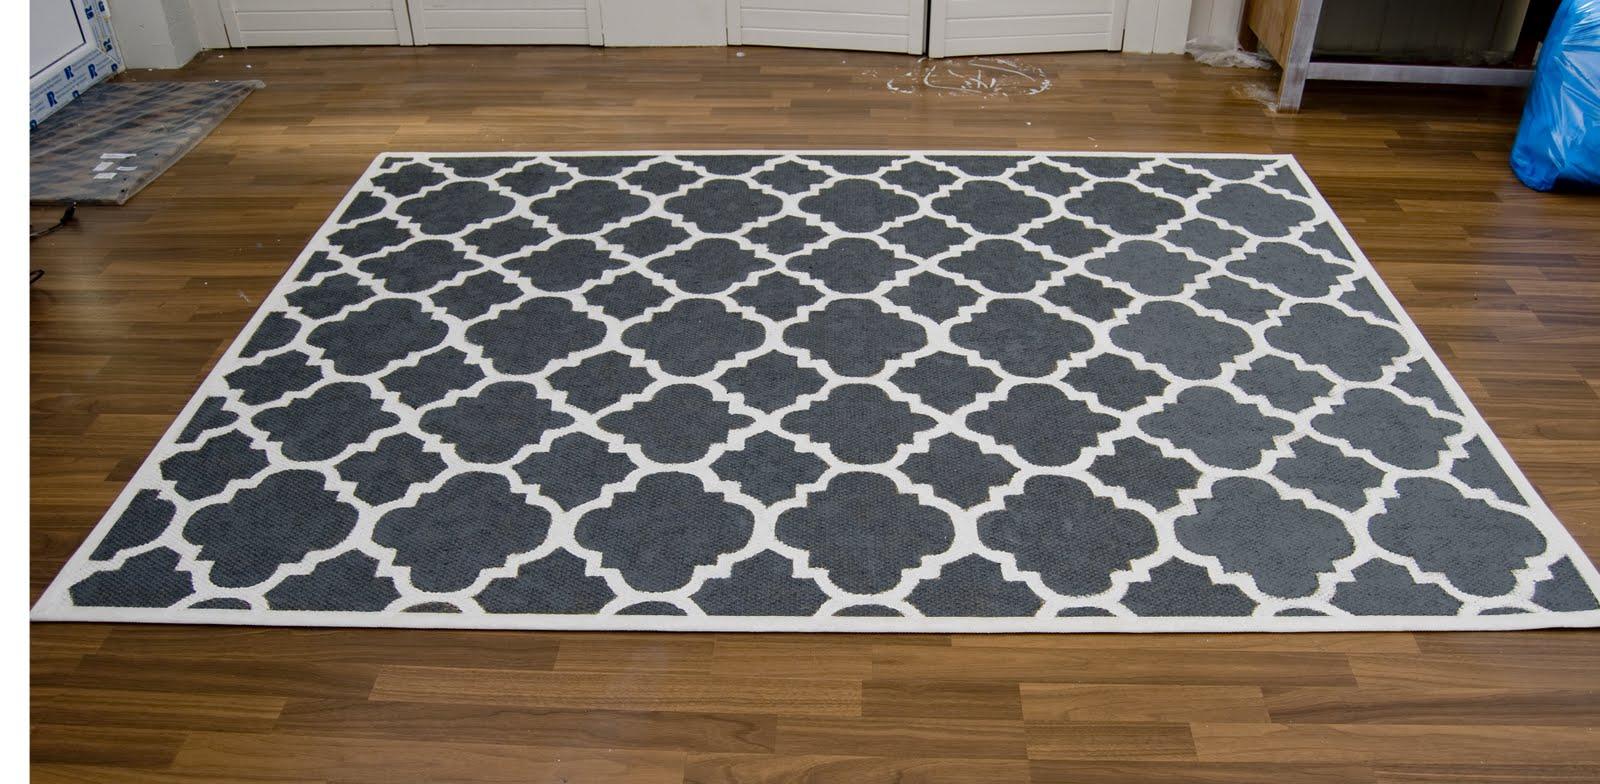 Tapetes Ikea Ikea Mbel Umgestalten Cm Pcs Patchwork Baby Play Mat  -> Tapetes Para Sala Ikea